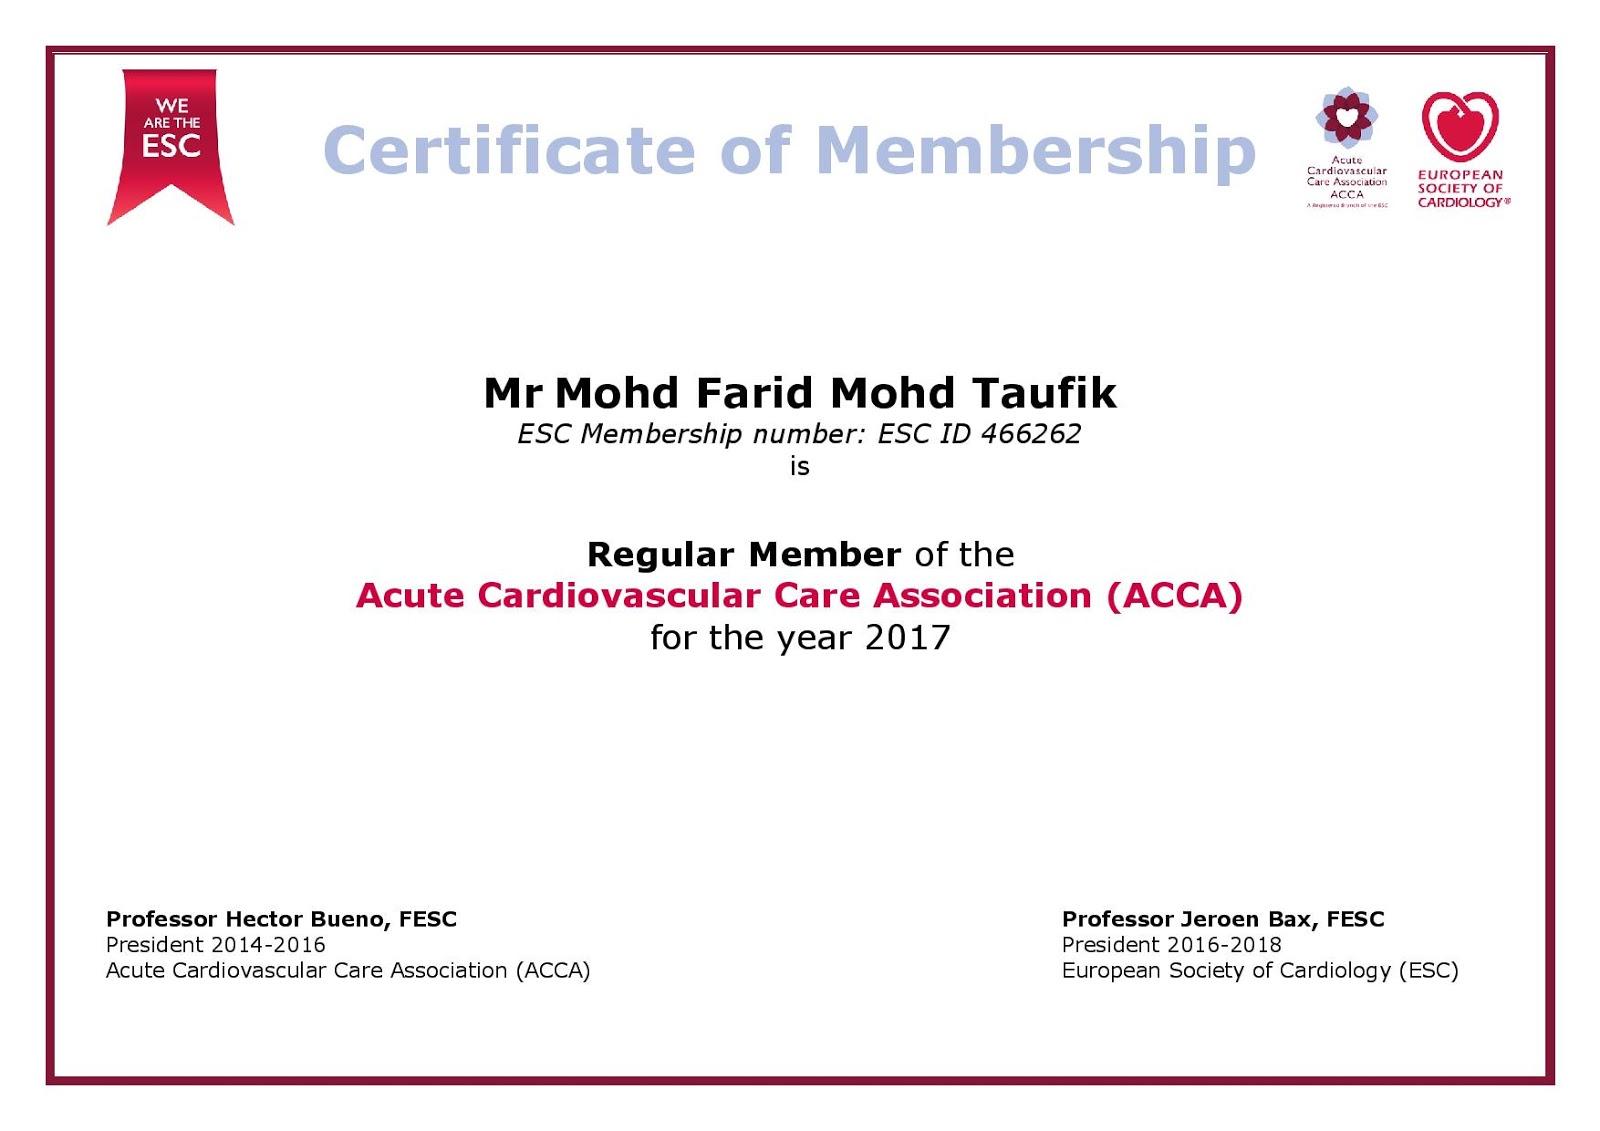 Cvt mohd farid my european society of cardiology sub society 2017 regular membership of acca esc xflitez Images